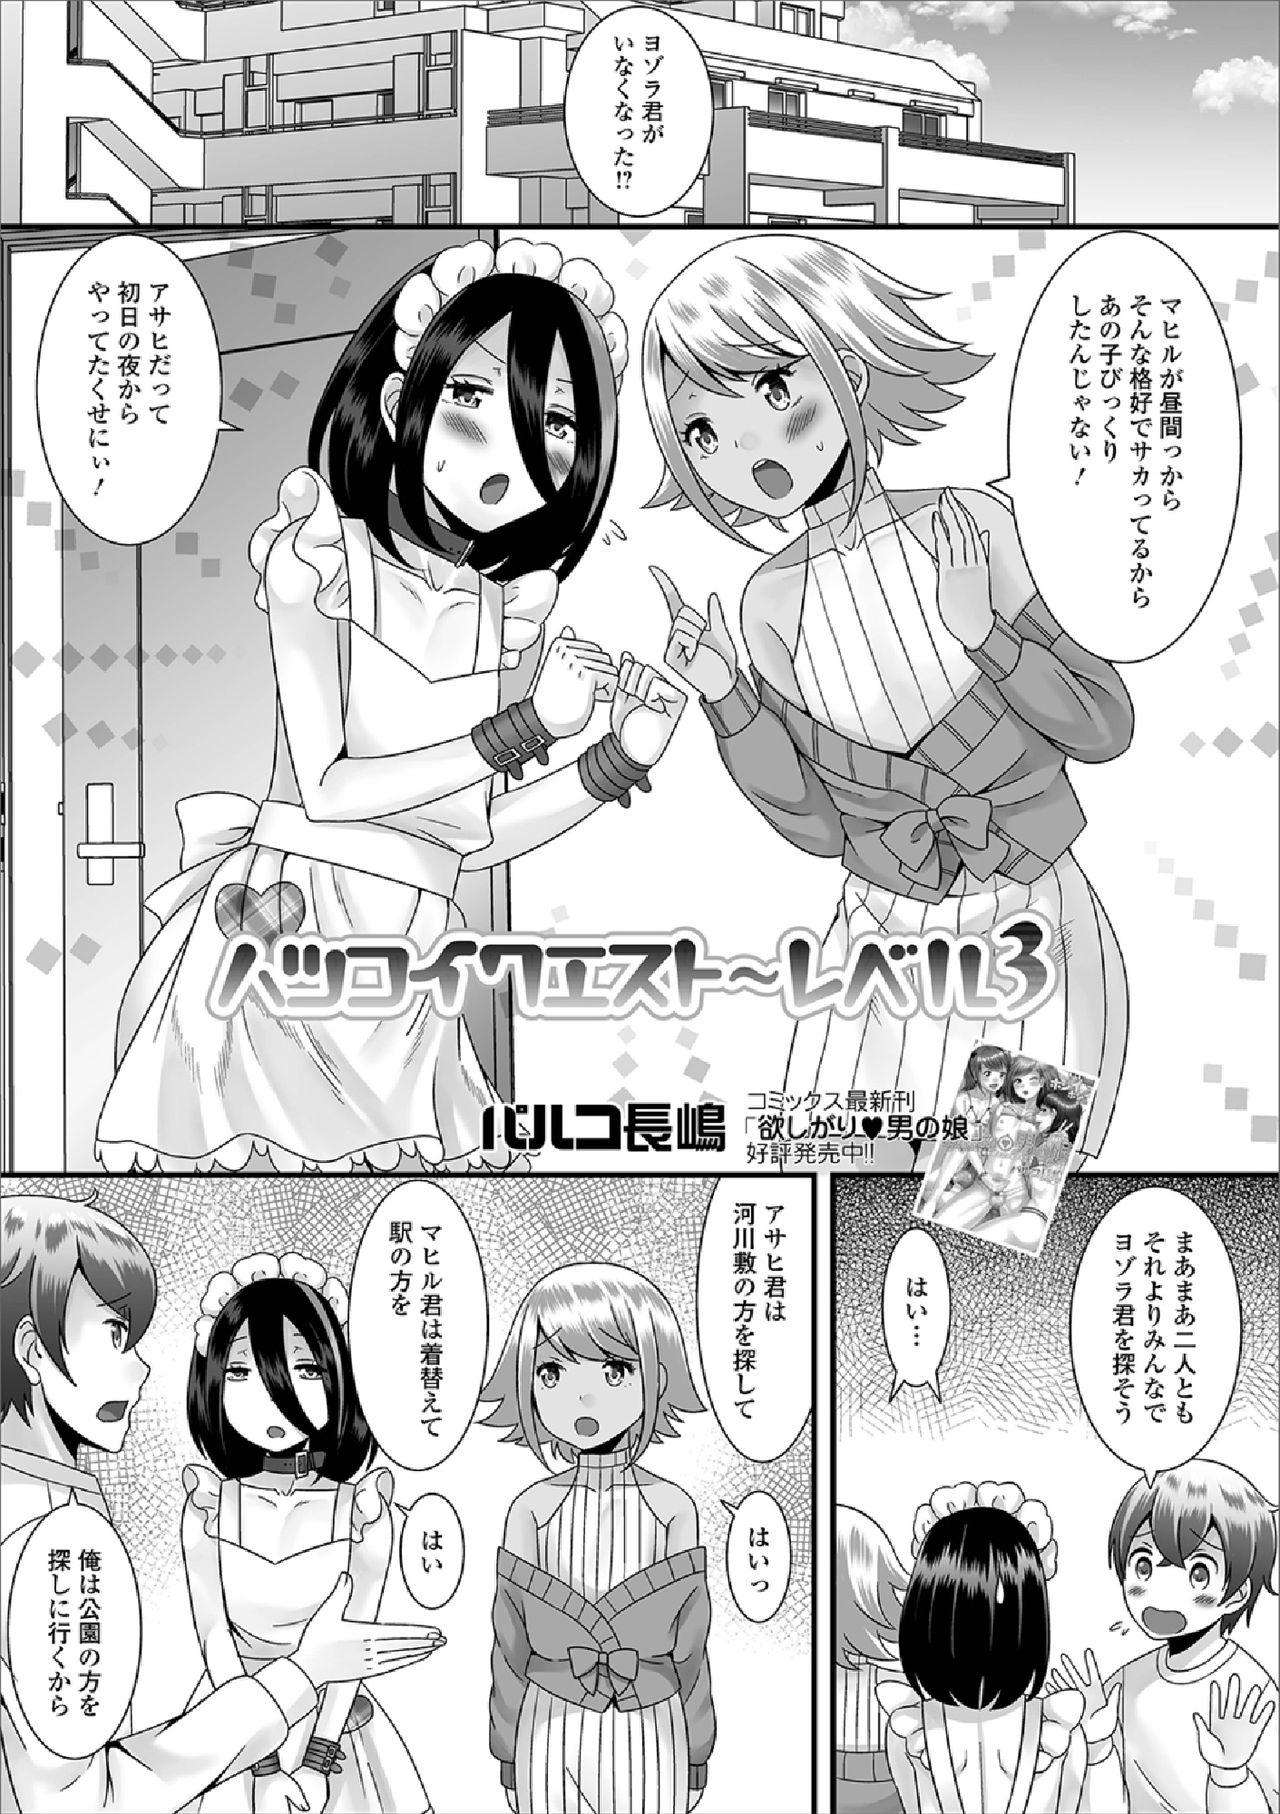 Gekkan Web Otoko no Ko-llection! S Vol. 38 2